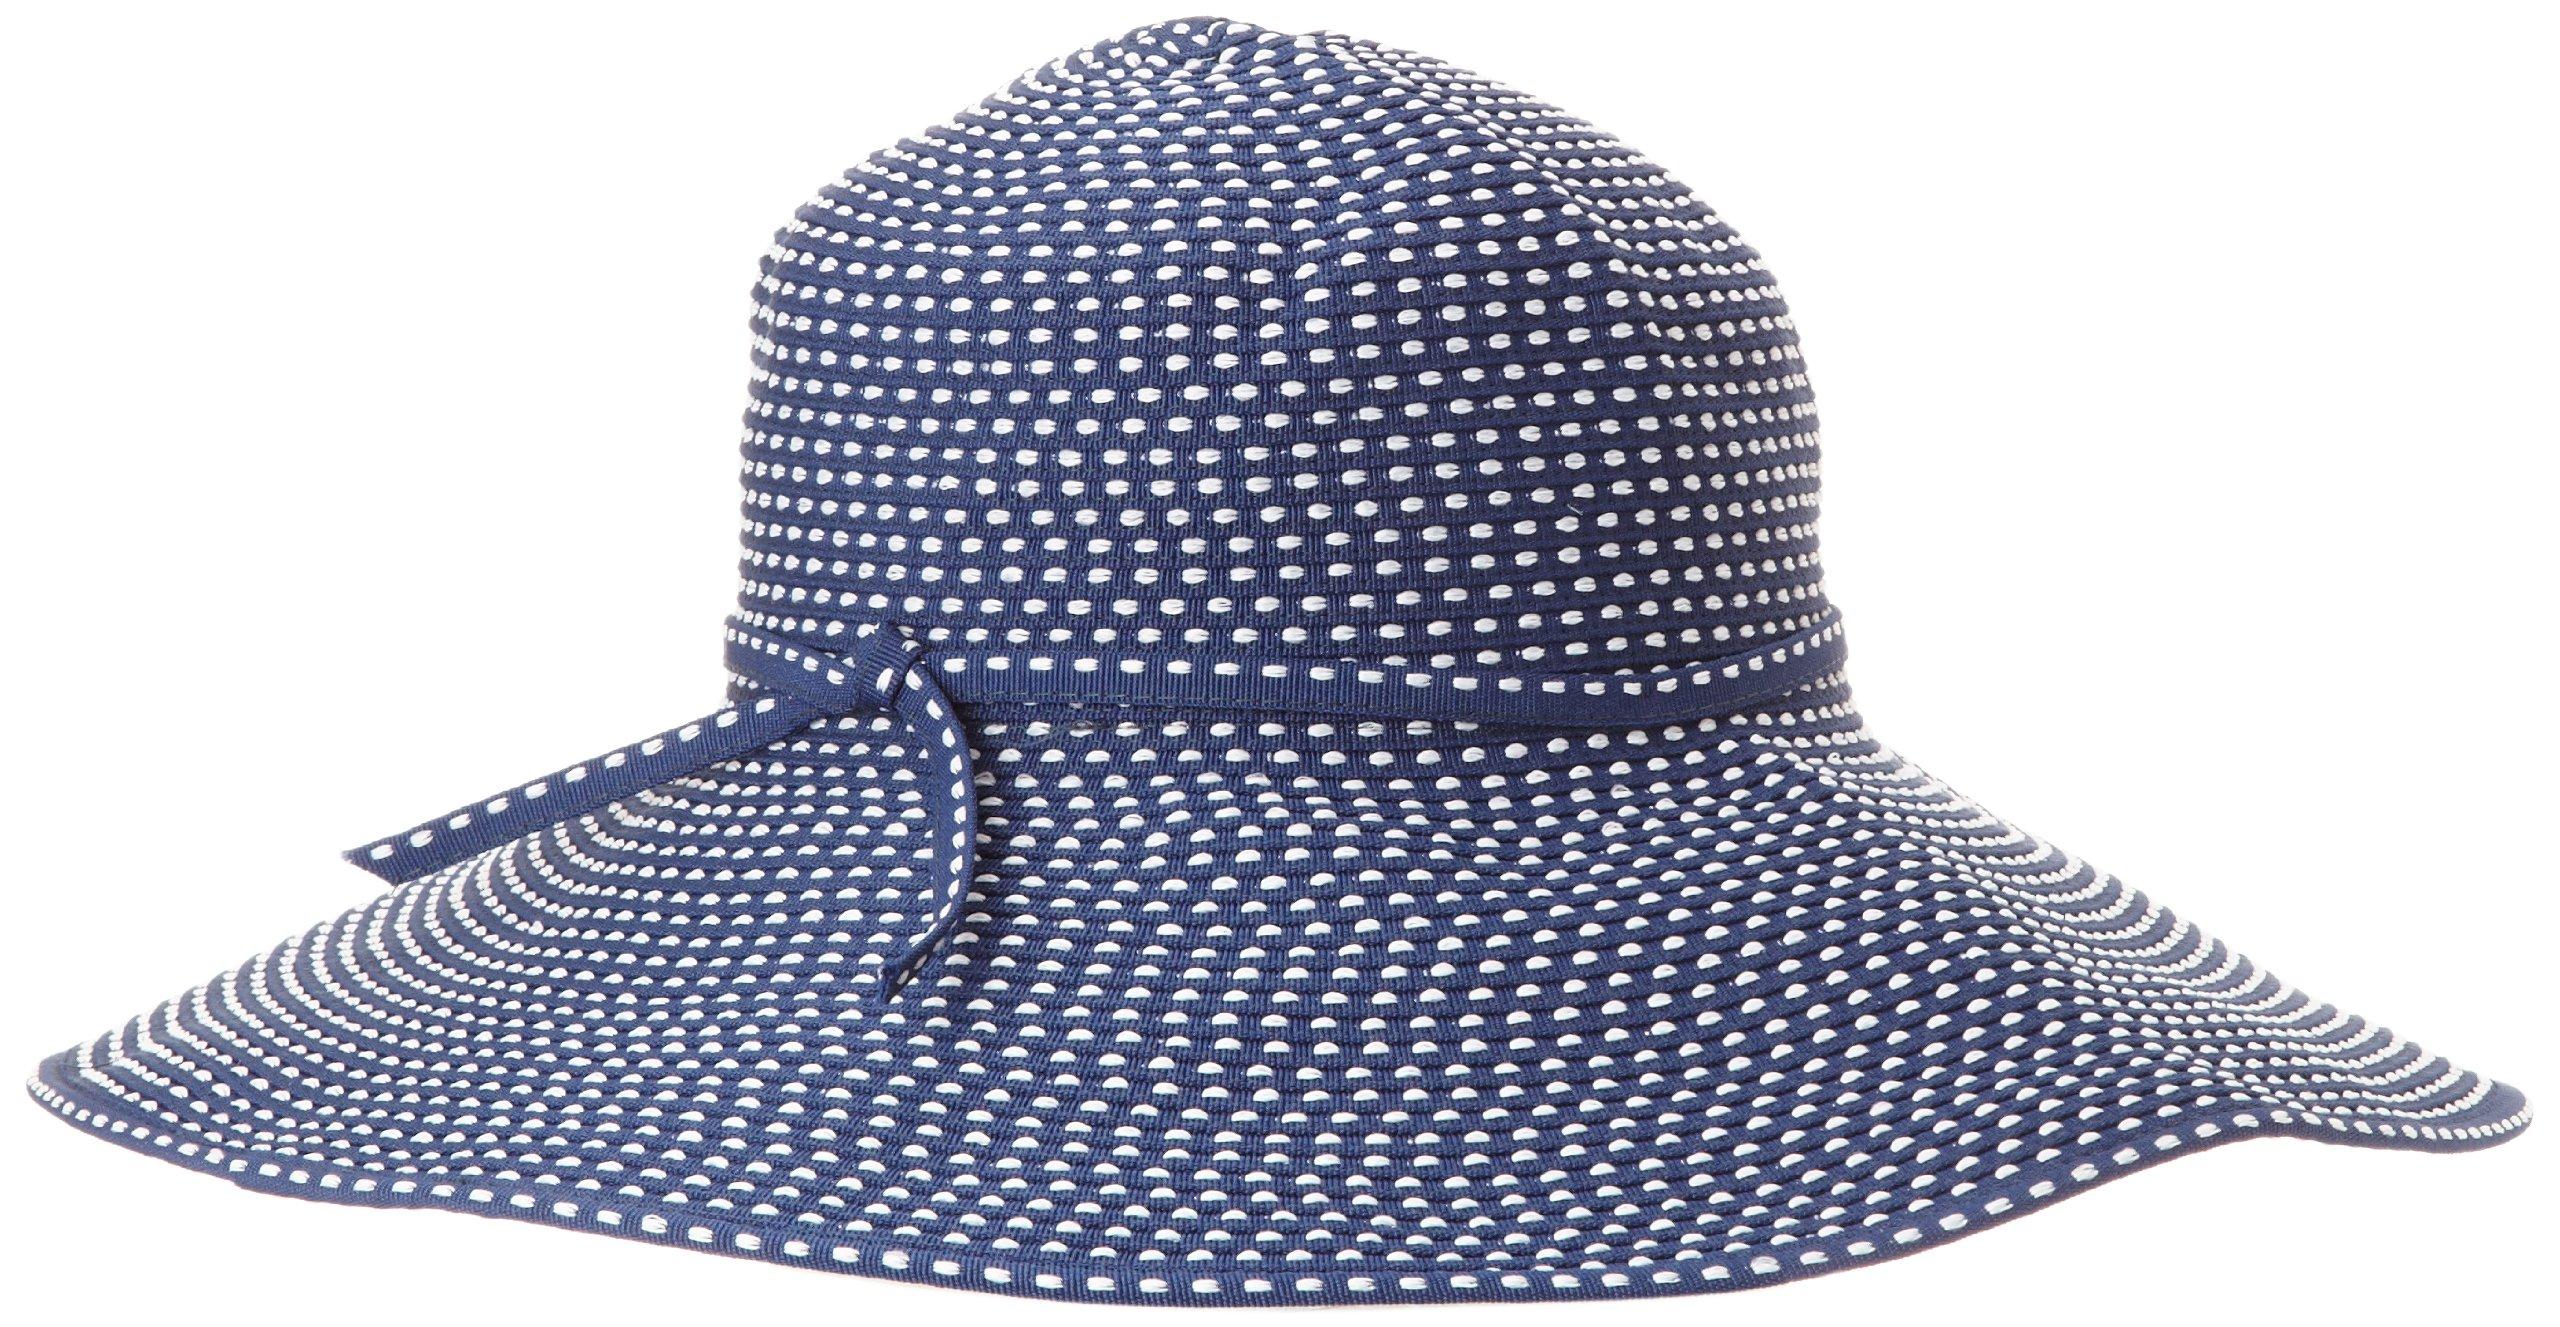 San Diego Hat Company Women's Ribbon Braid Hat With 5 Inch Brim,Navy,One Size